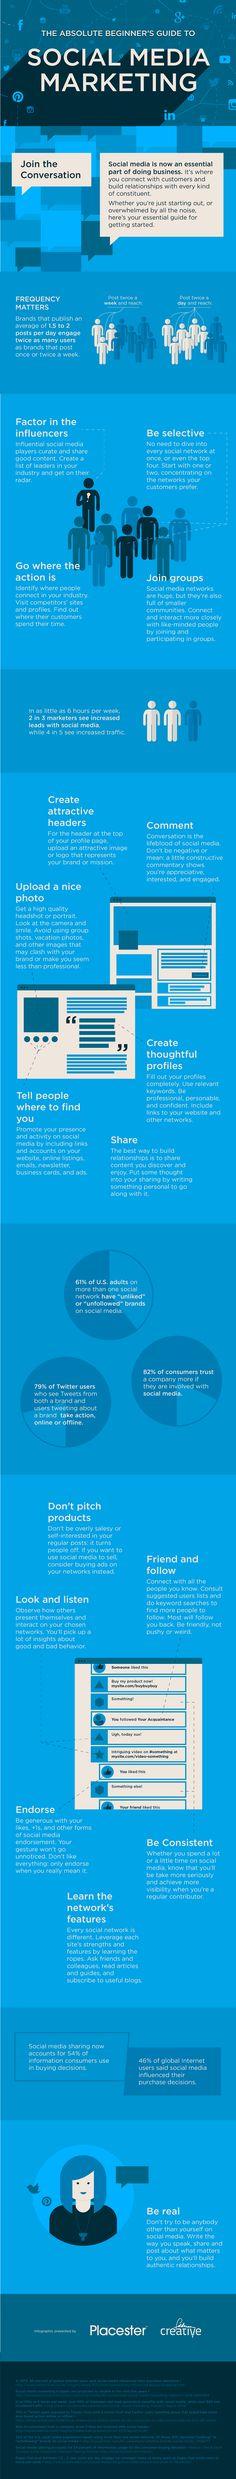 The-Absolute-Beginners-Guide-to-Social-Media-Marketing-Infographic-Juntae-DeLane #socialmedia #marketing